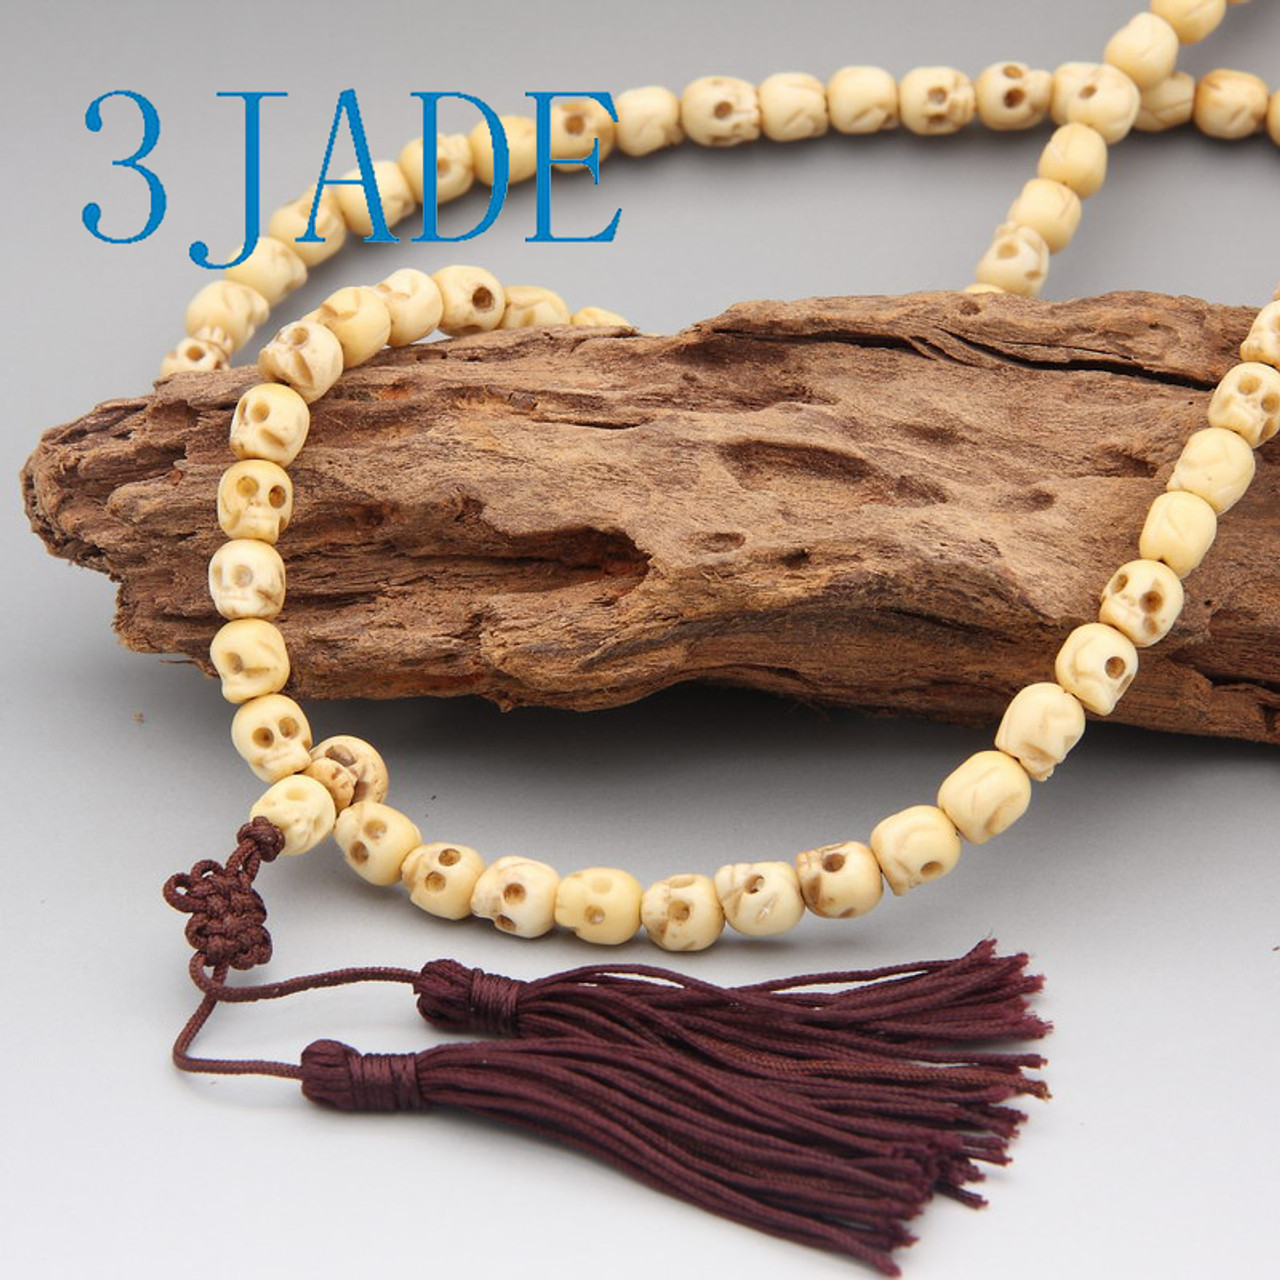 44 Tibetan Carved Bone Skull Meditation Prayer Beads Mala E011002b 3jade Wholesale Of Jade Carvings Jewelry Collectables Prayer Beads